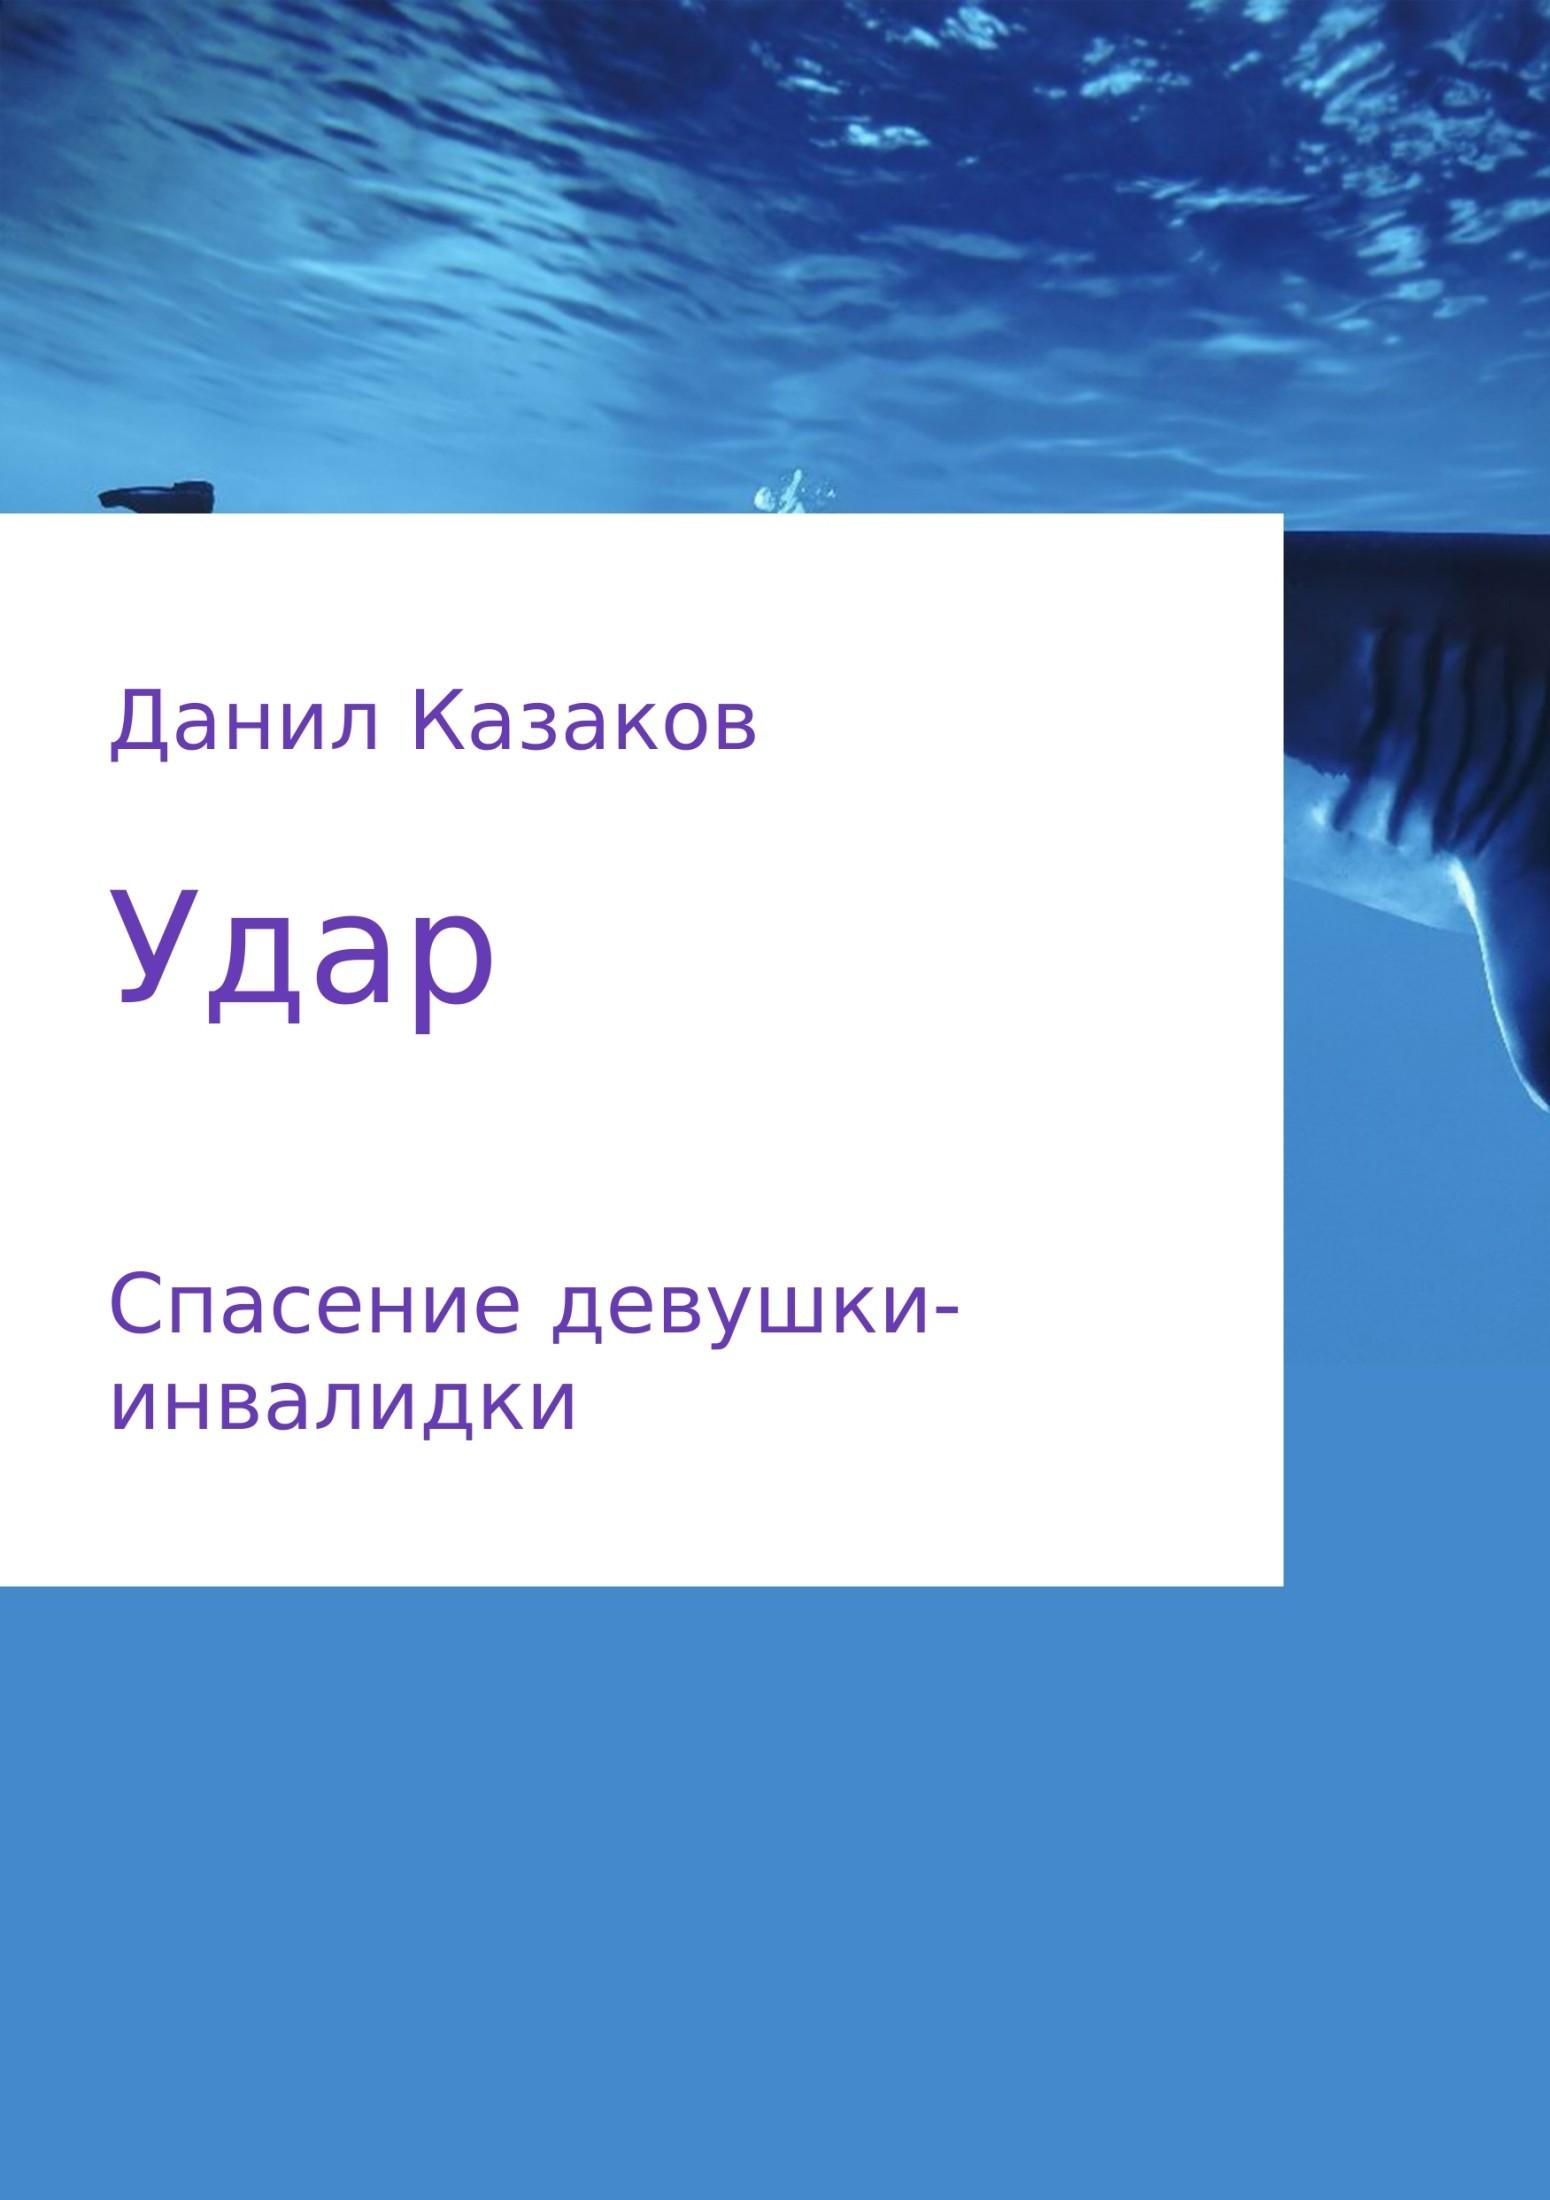 Данил Васильевич Казаков Удар данил васильевич казаков монтекки и капулетти